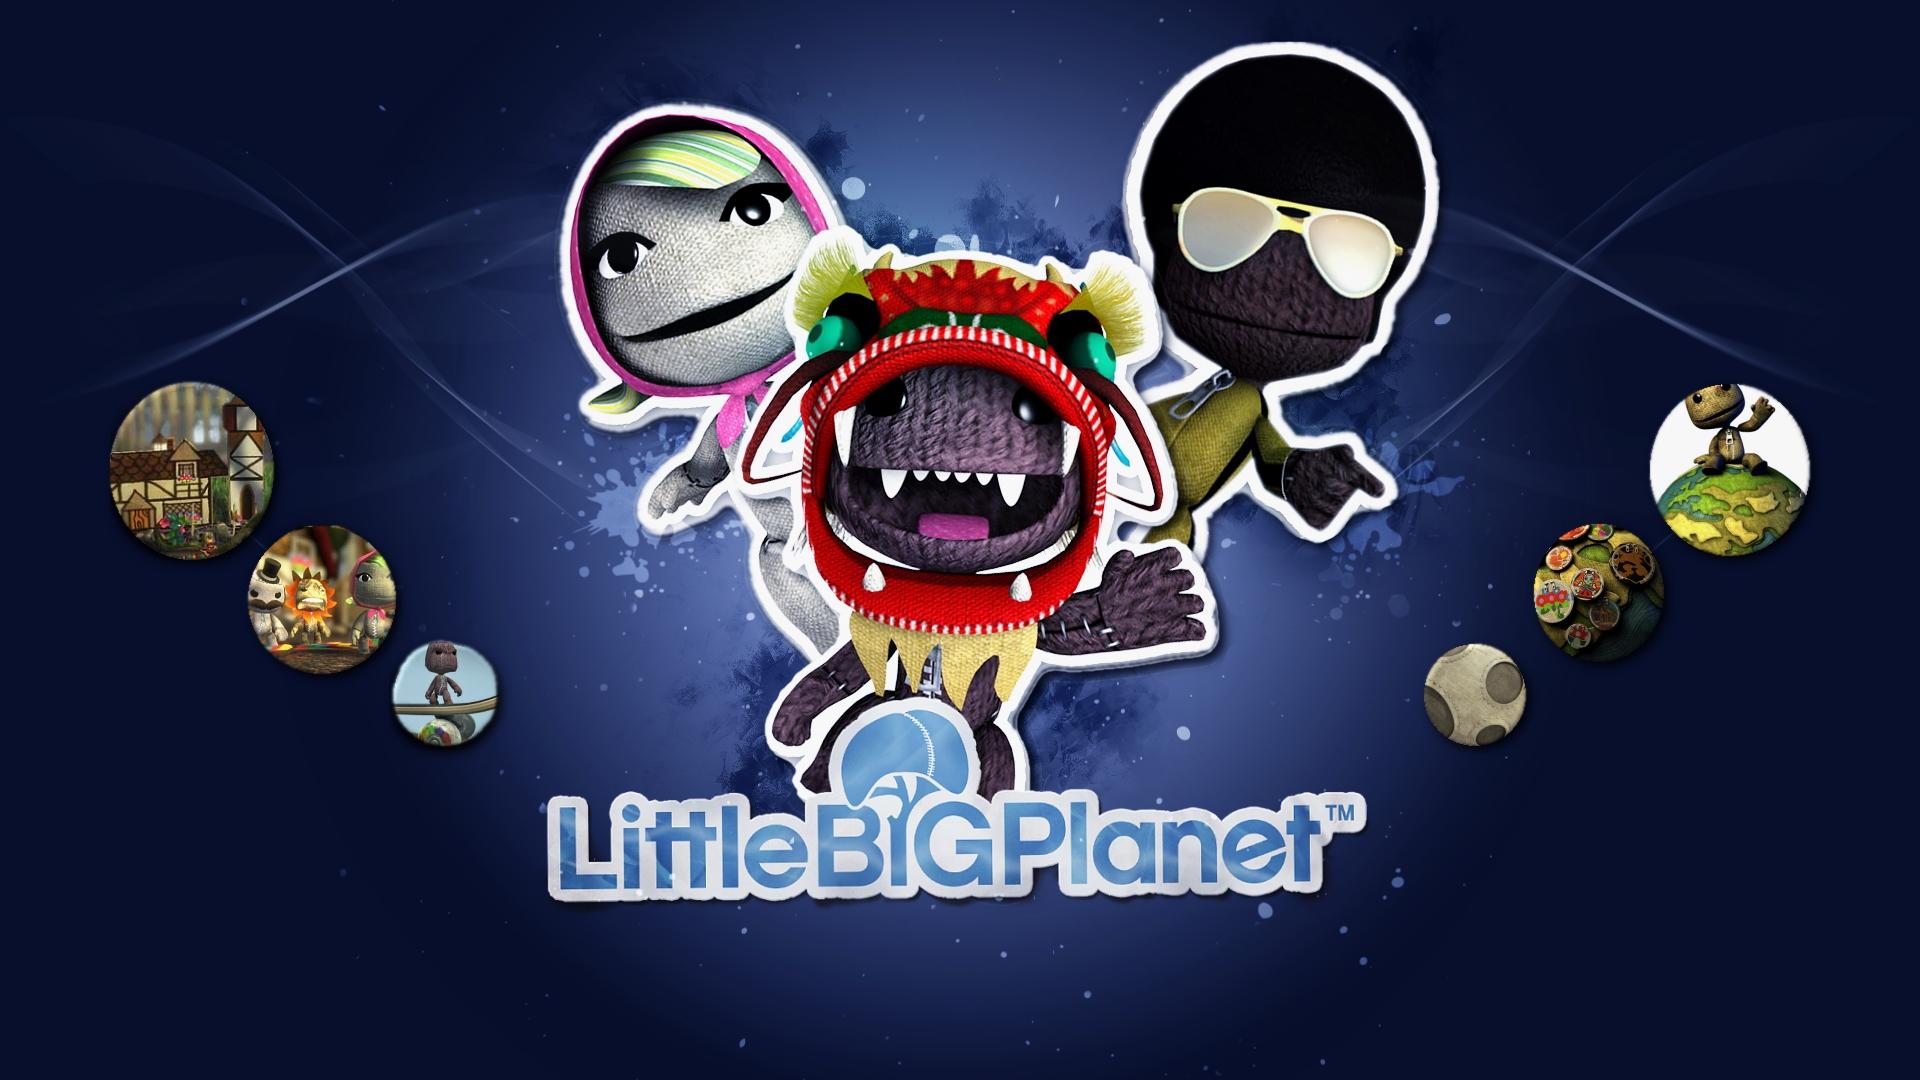 графика игры The Little Big Planet graphics game  № 1878097 бесплатно